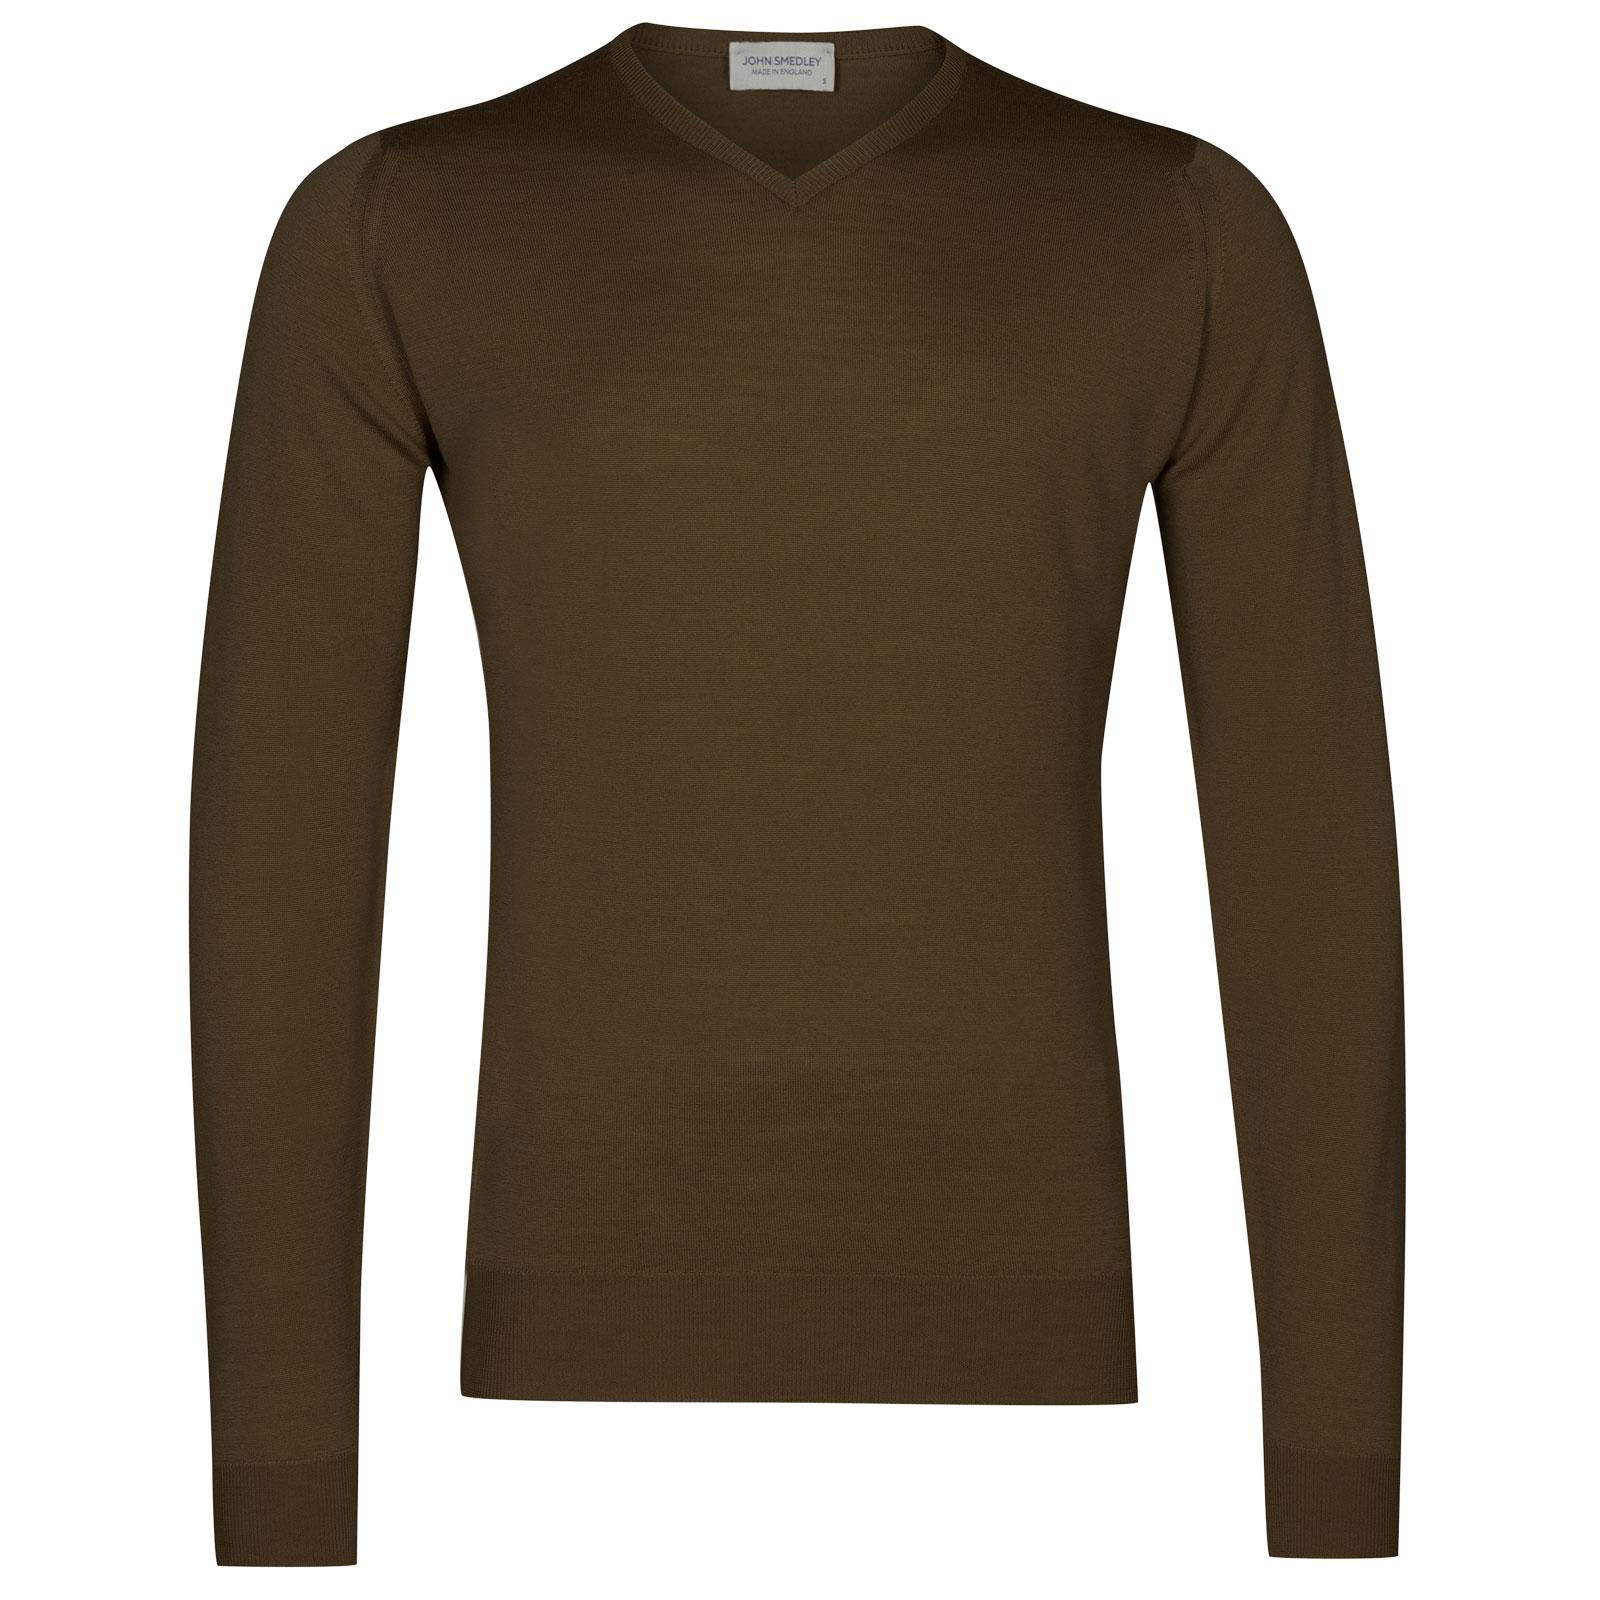 John Smedley shipton Merino Wool Pullover in Kielder Green-XL